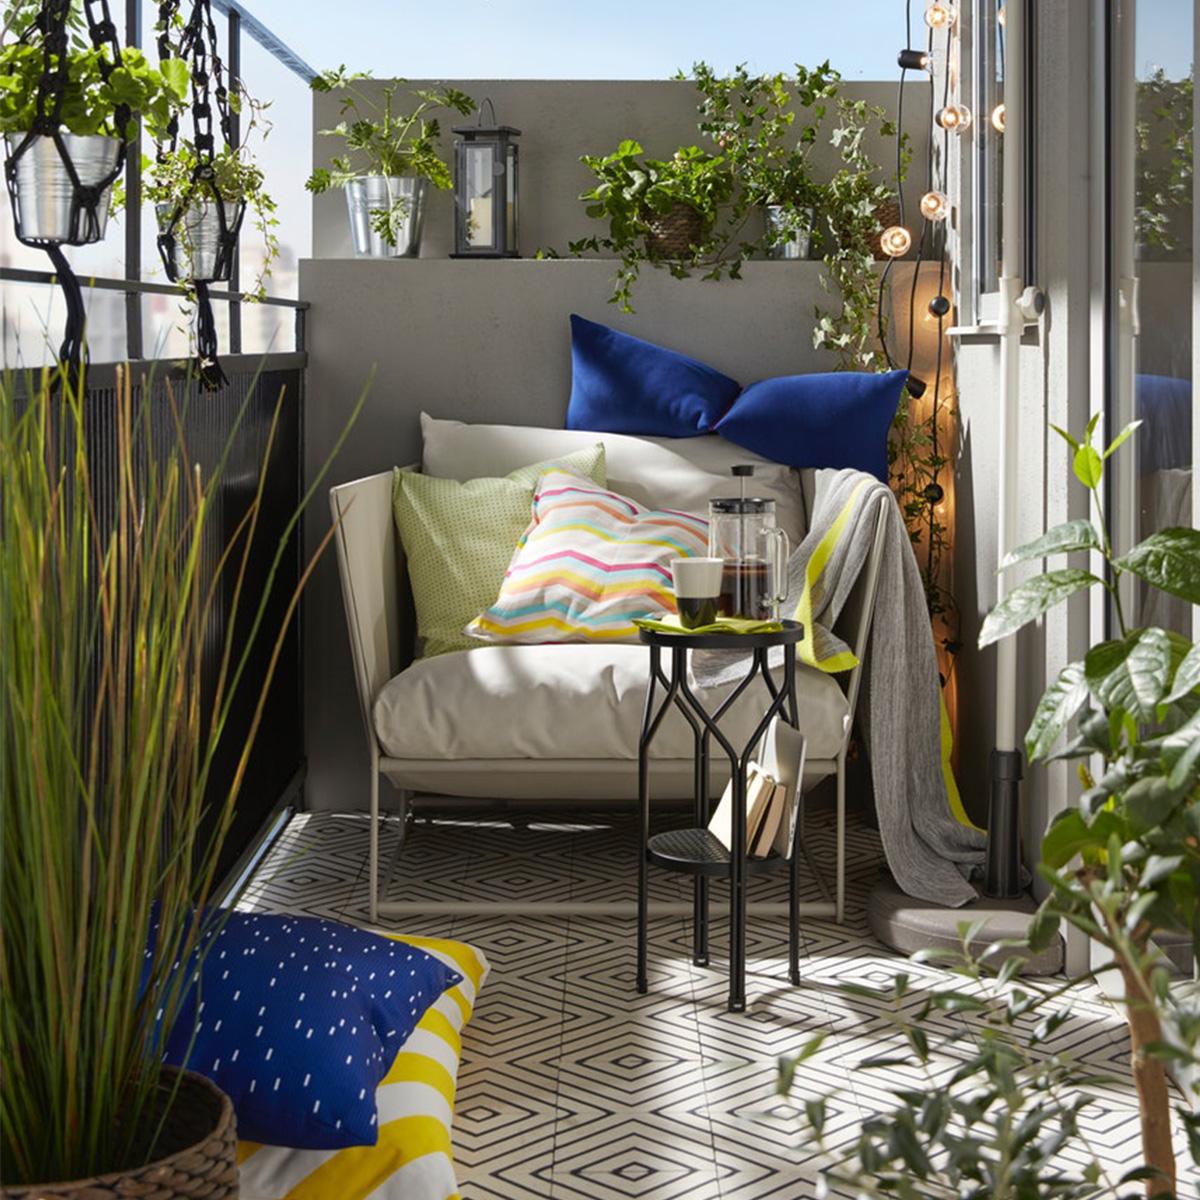 Tavolino Per Balcone Ikea furnishing ideas for garden and balcony - ikea - ikea